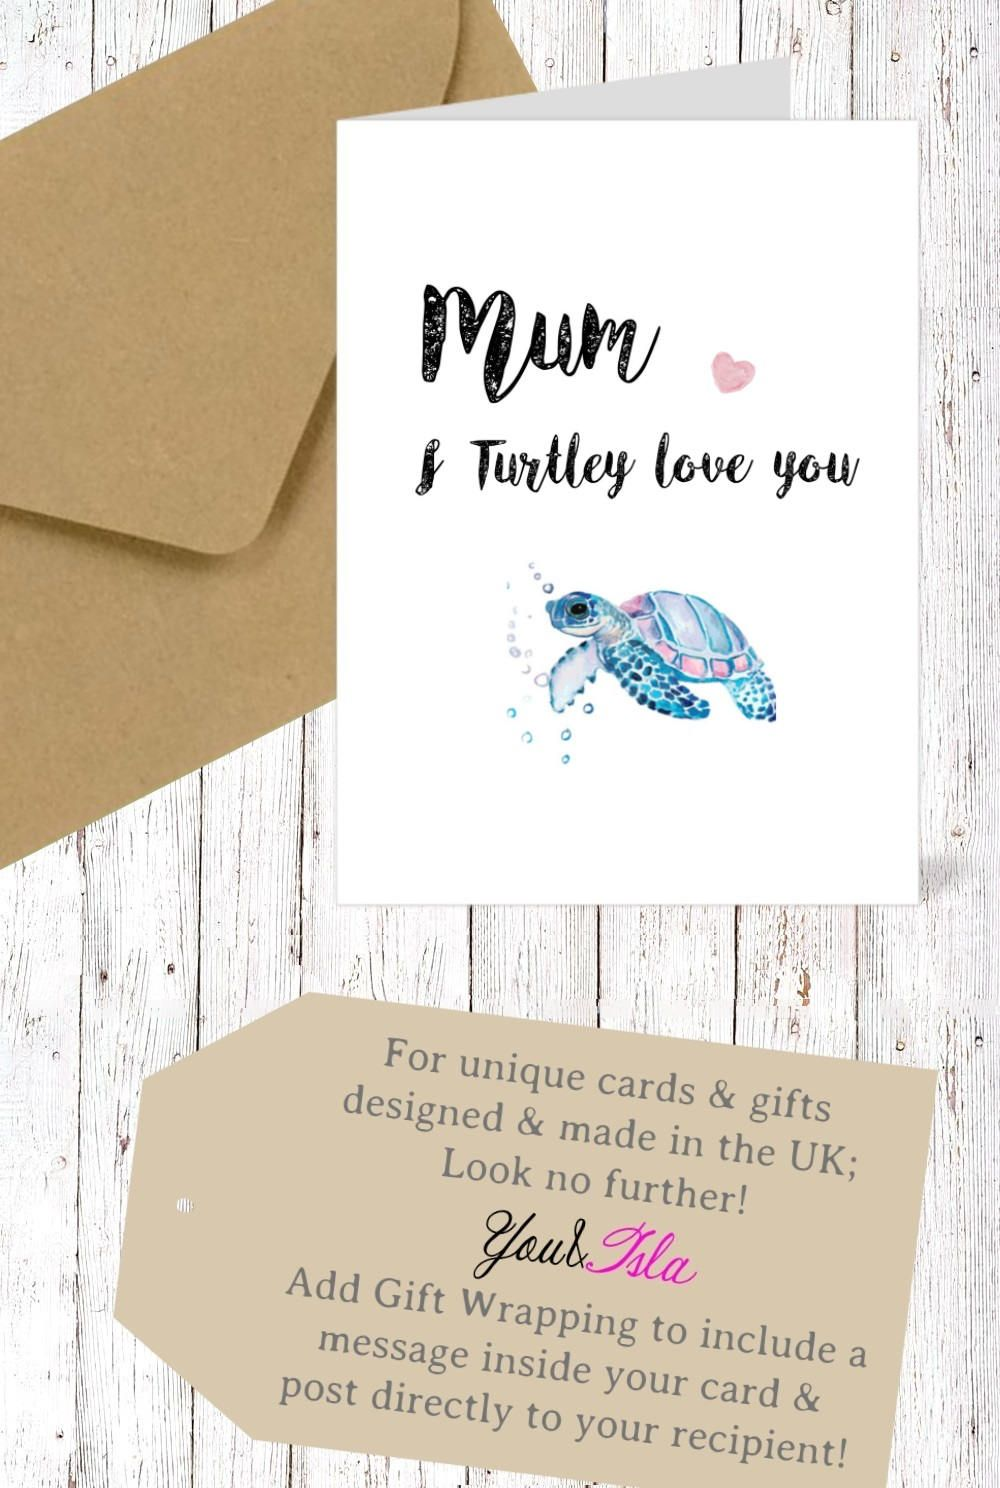 NANNY Mum I Turtley Love You Mothers Day CARD Turtle Card Nanny Wife Birthday Friend Friendship Valentines